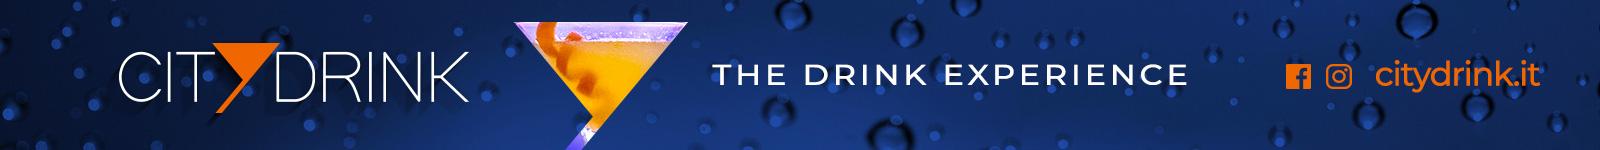 CITY DRINK UNDER DESKTOP